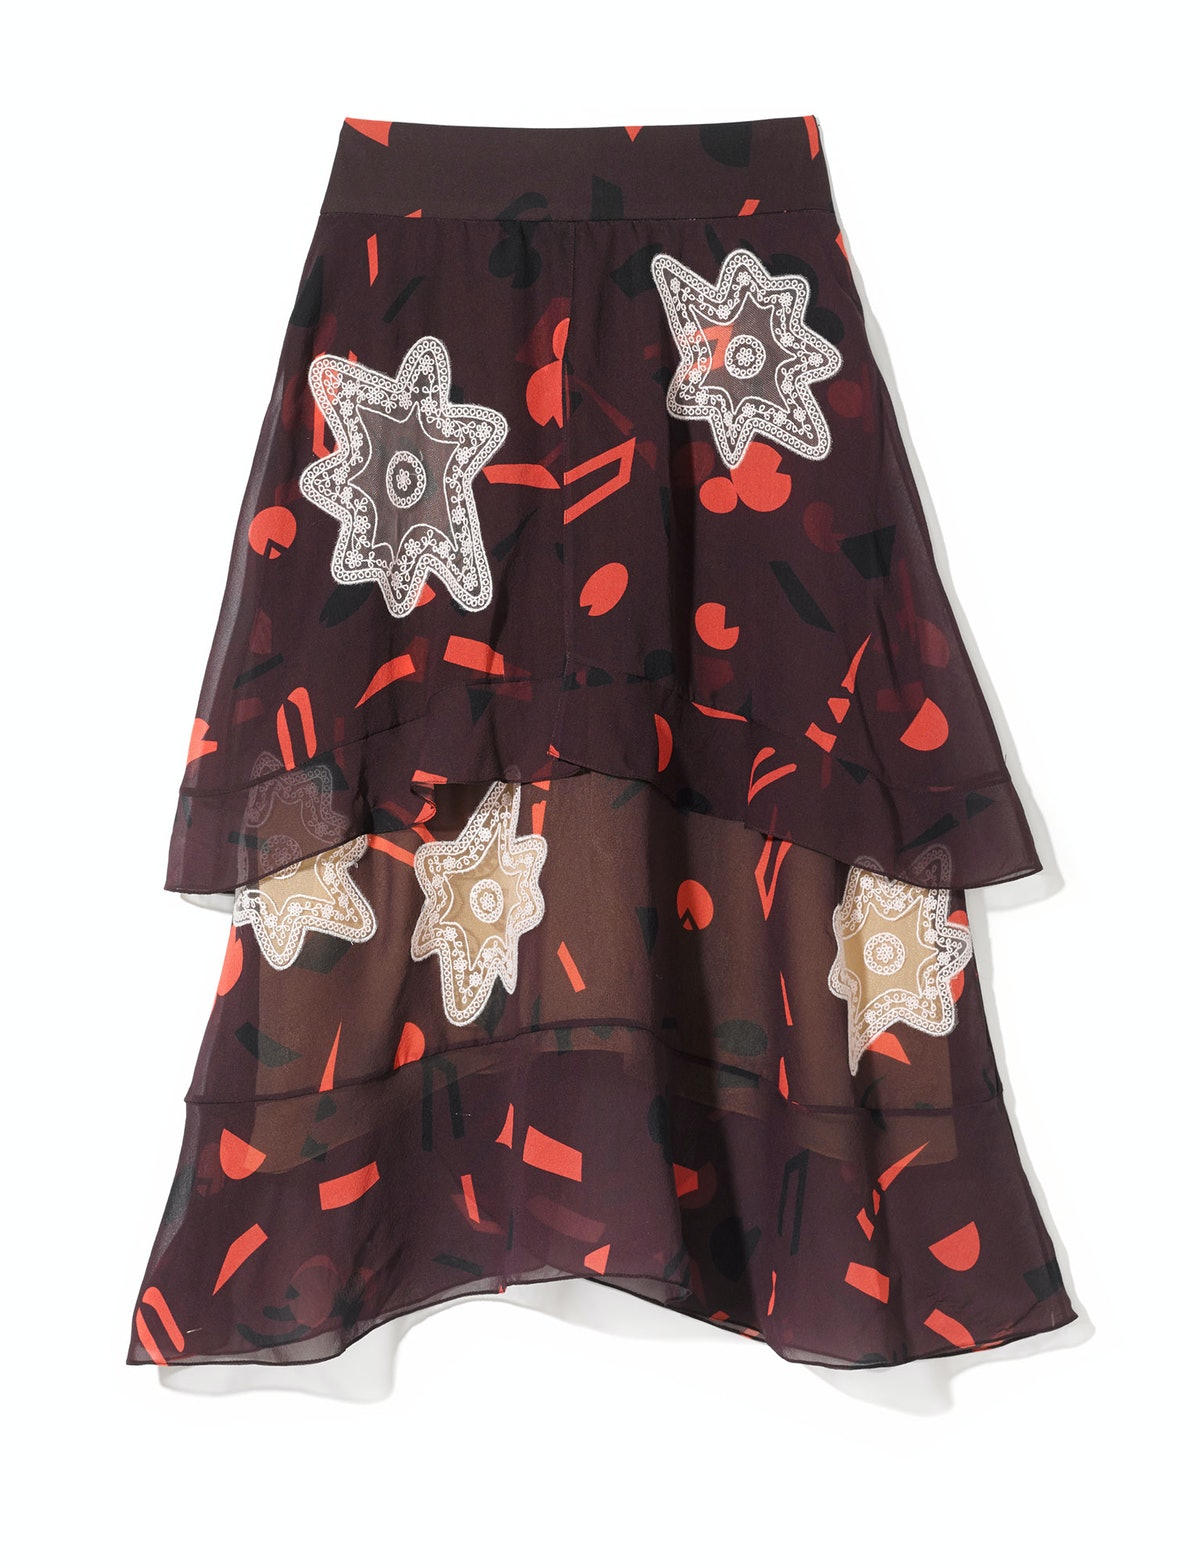 Chloé skirt